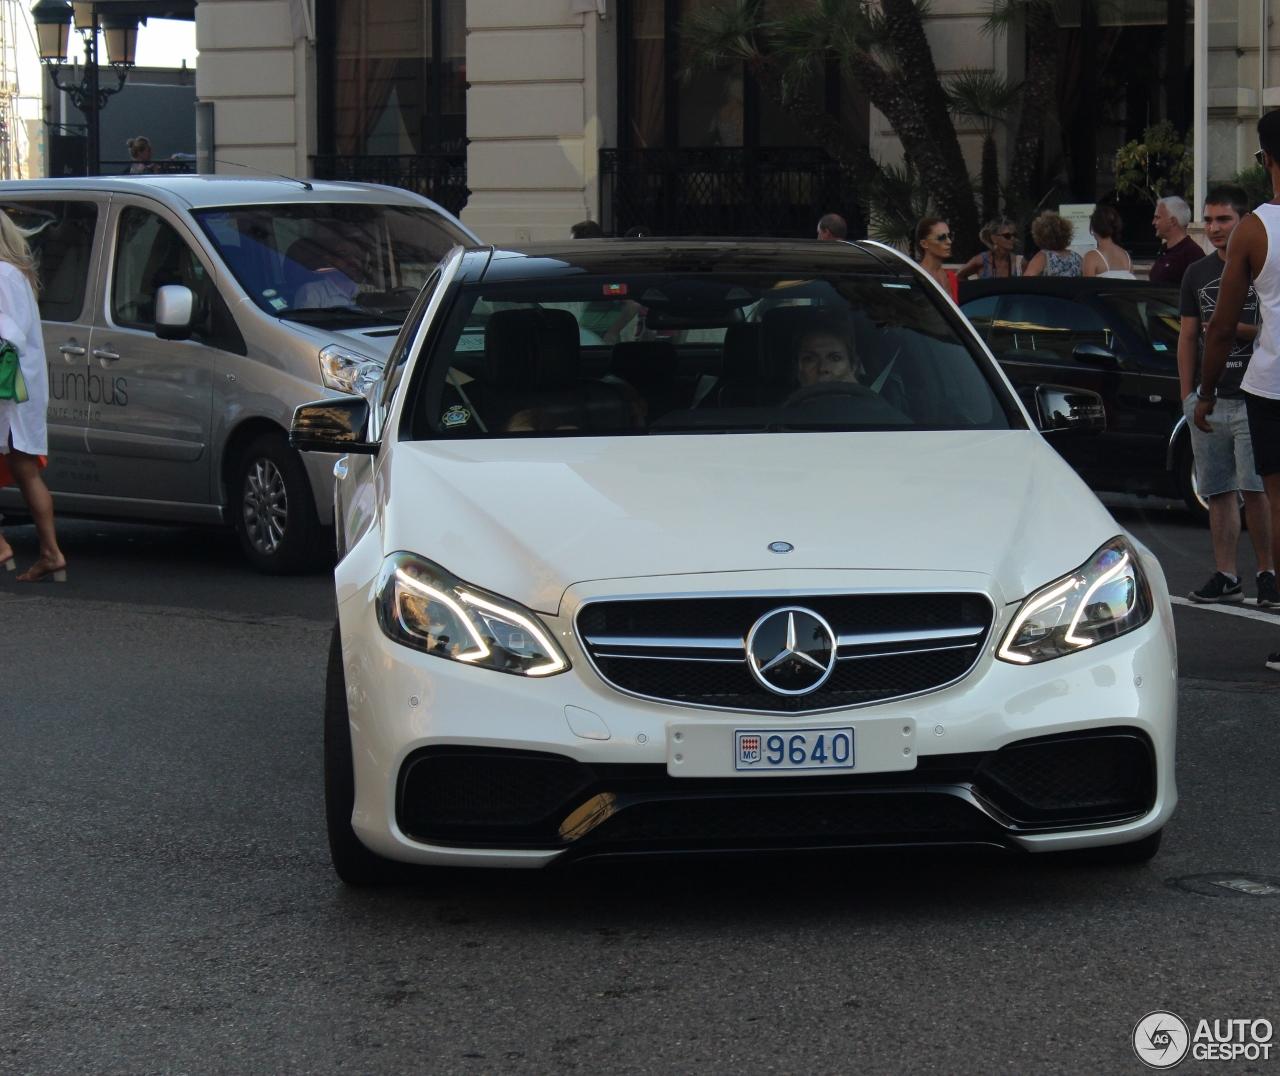 2018 Mercedes Amg E 63 S 4matic Sedan White Road: Mercedes-Benz E 63 AMG S W212